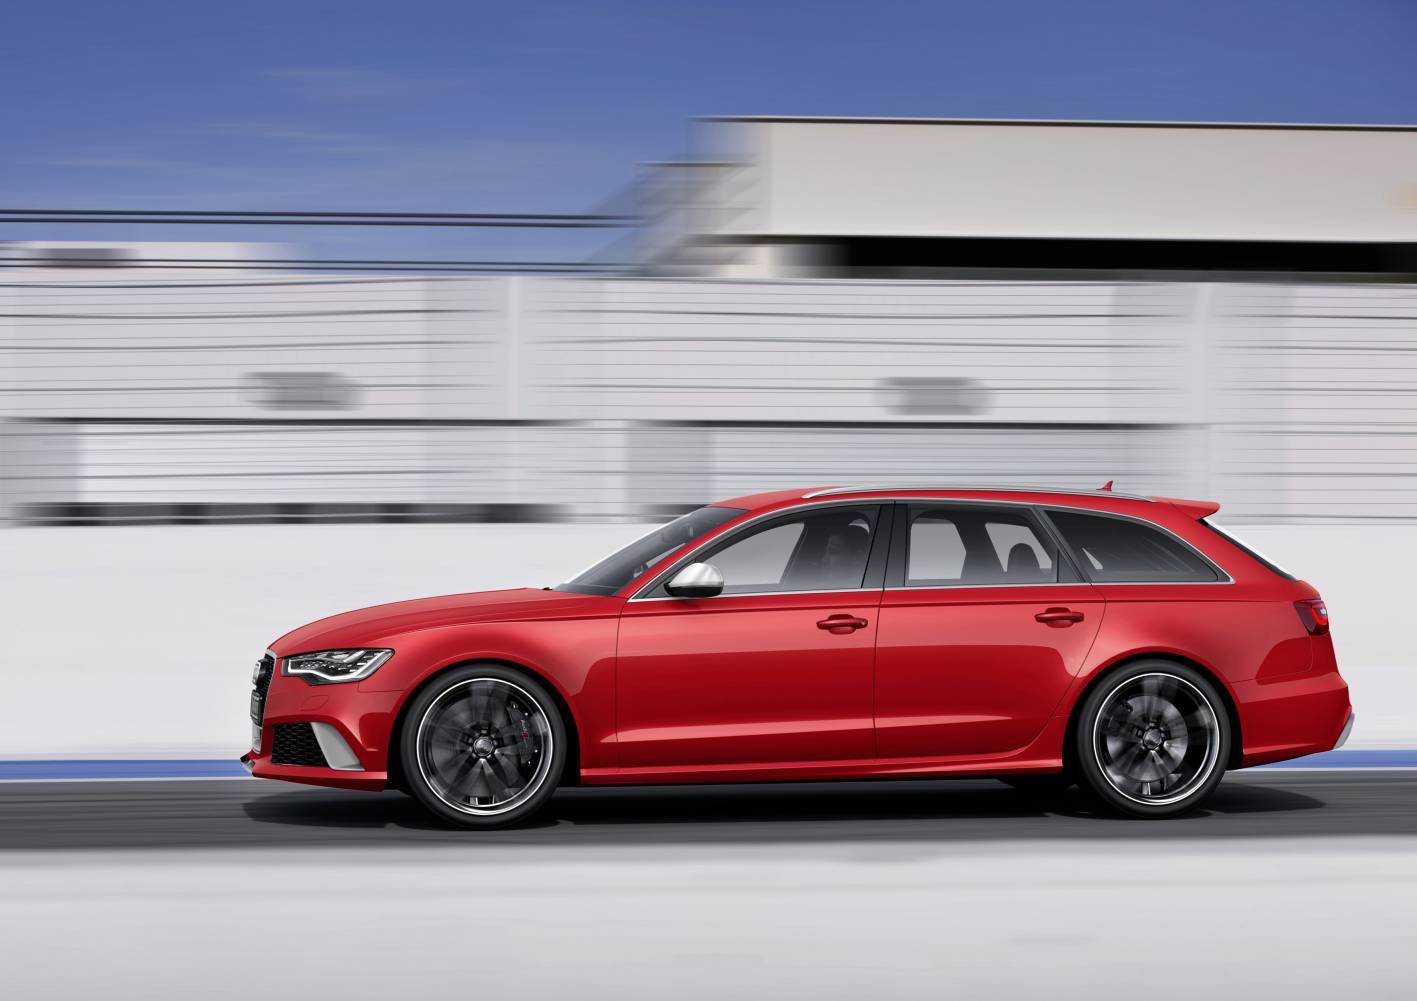 http://www.forcegt.com/wp-content/uploads/2012/12/Audi-RS6-Avant-11.jpg